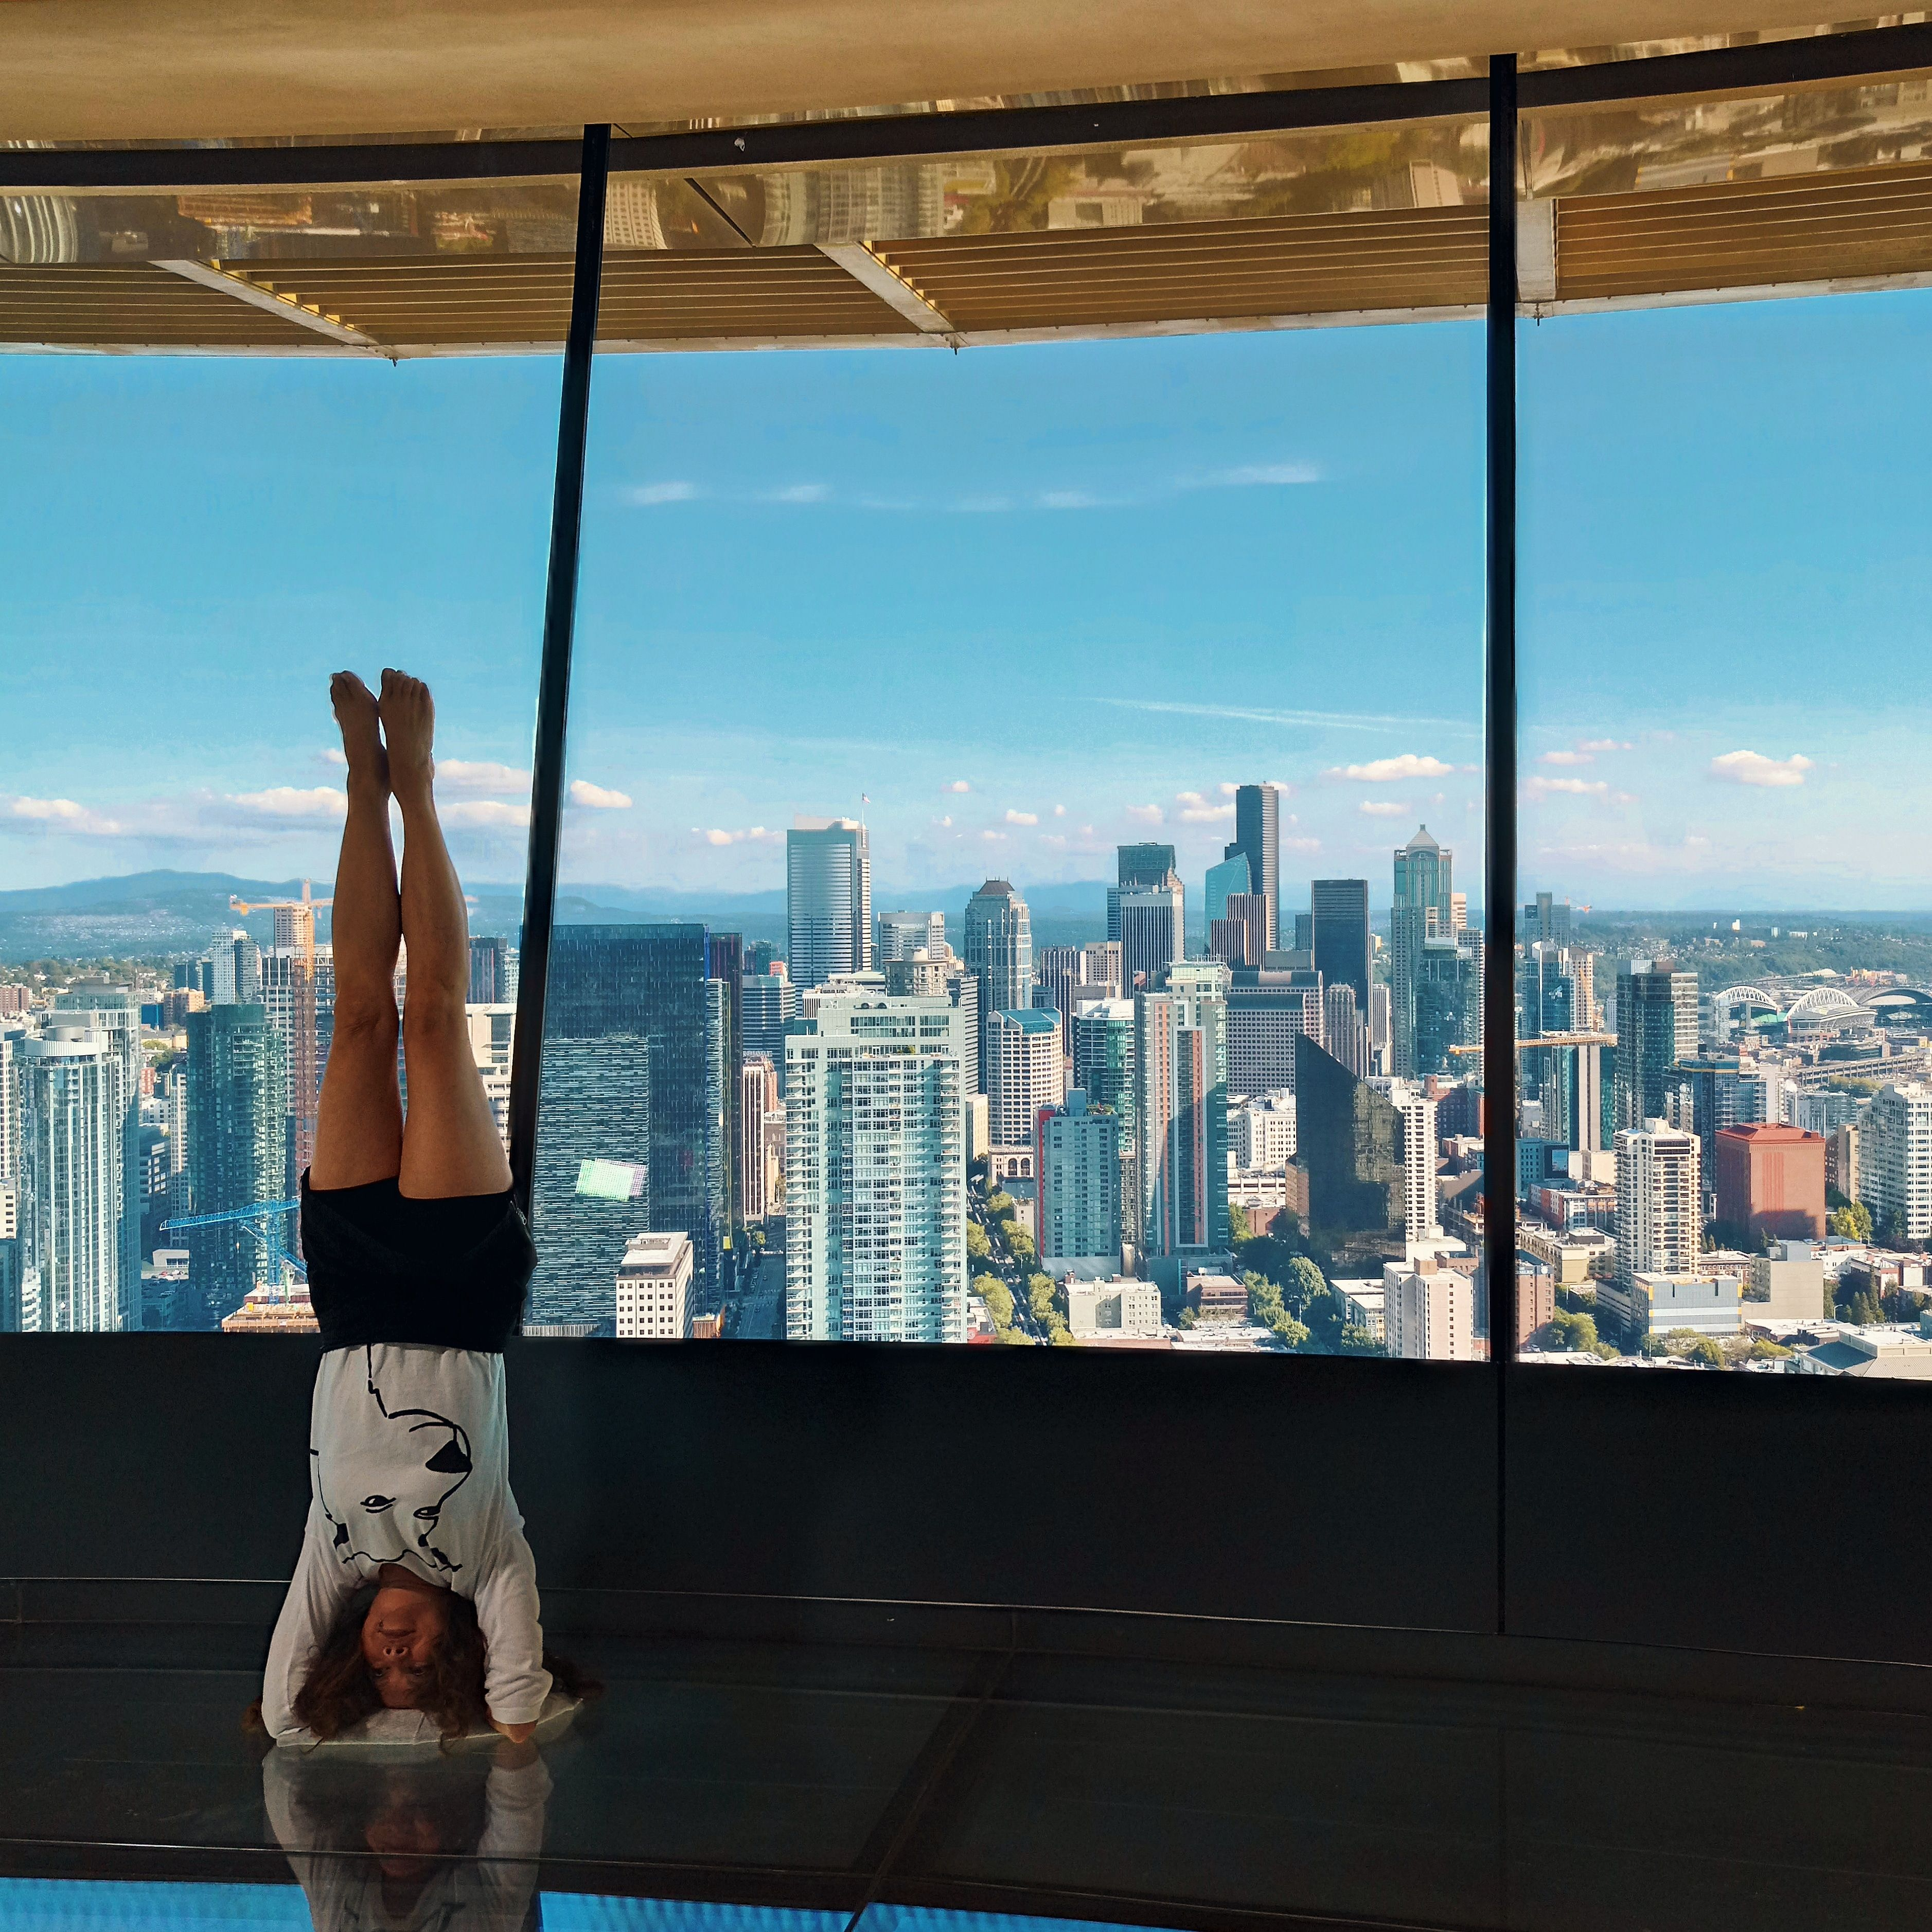 Some Awesome Yoga Moves At Space Needle Seattle Washington